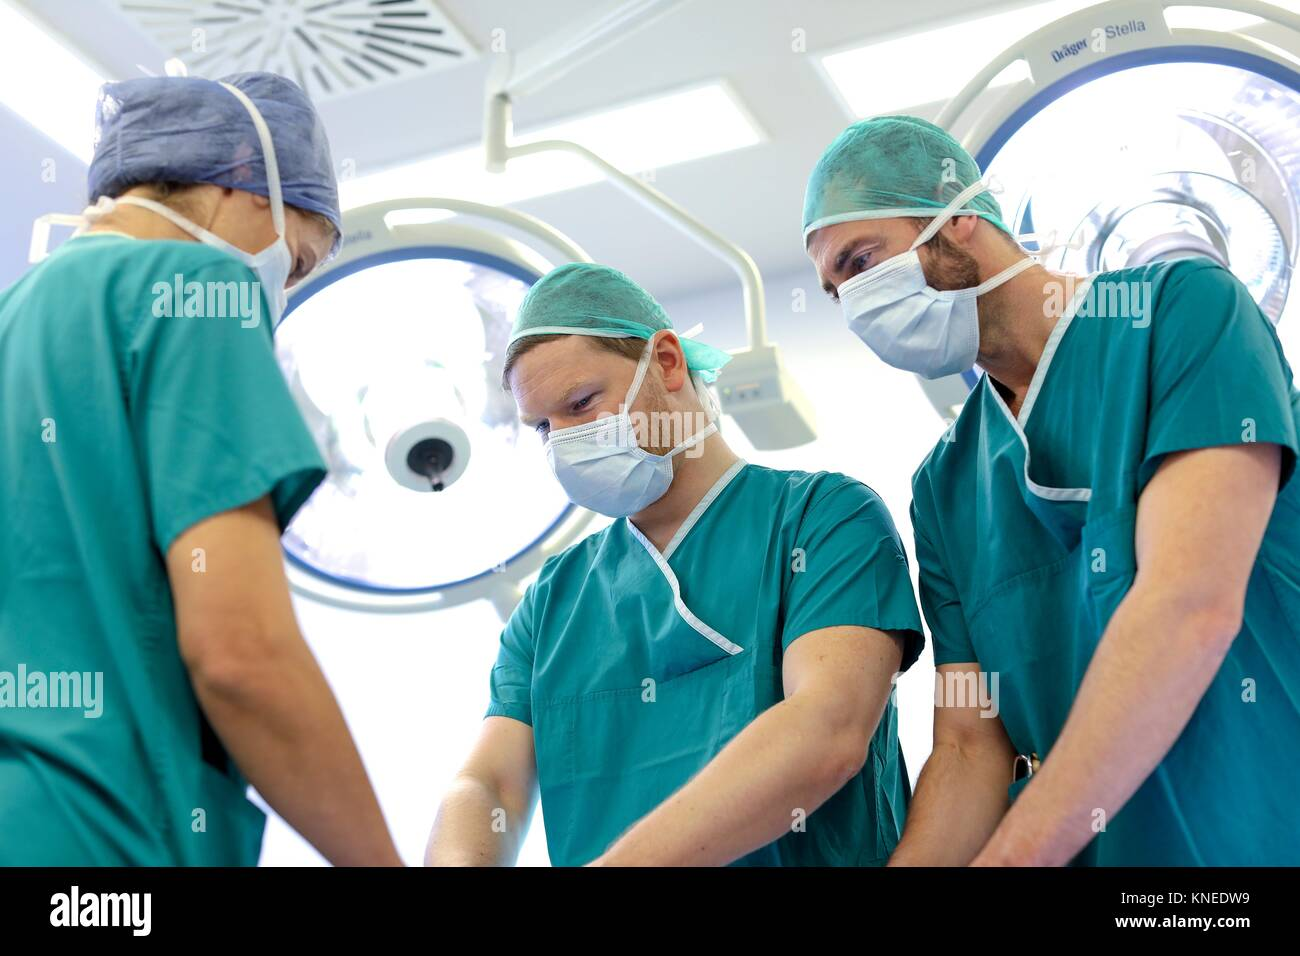 Surgery, Operating room, Hospital, Spain - Stock Image